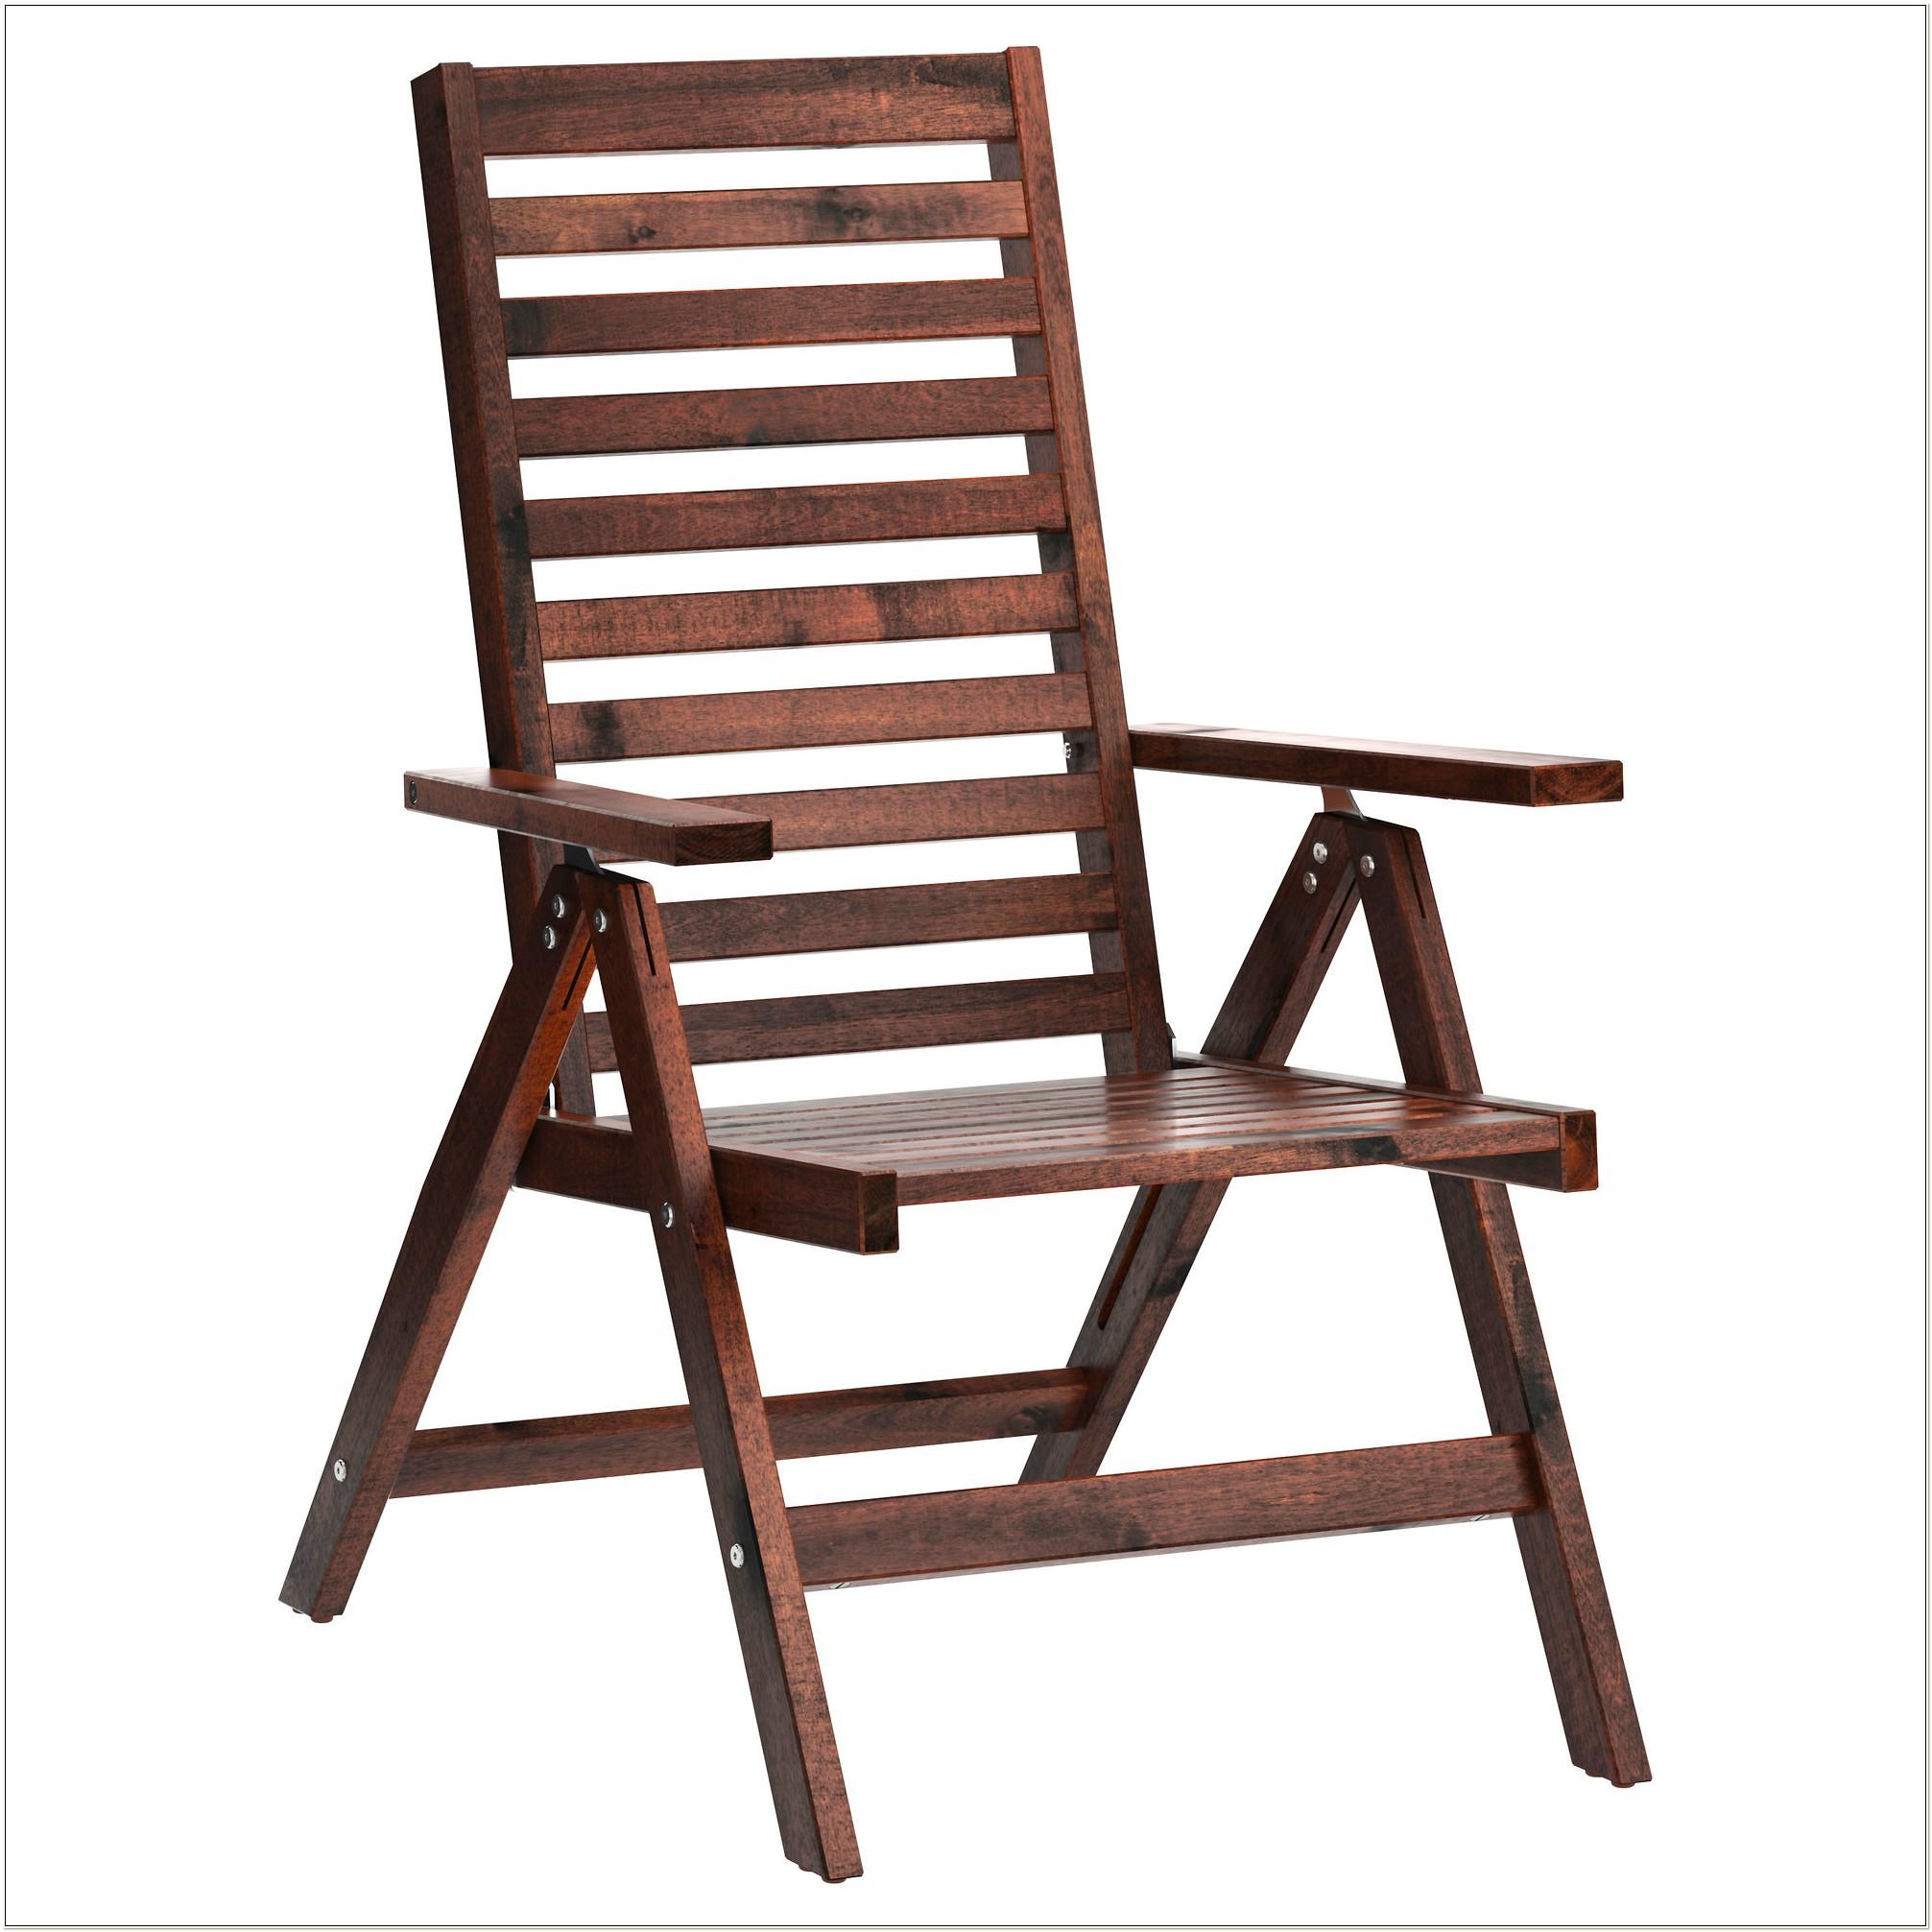 Ikea Wooden Folding Chairs Australia